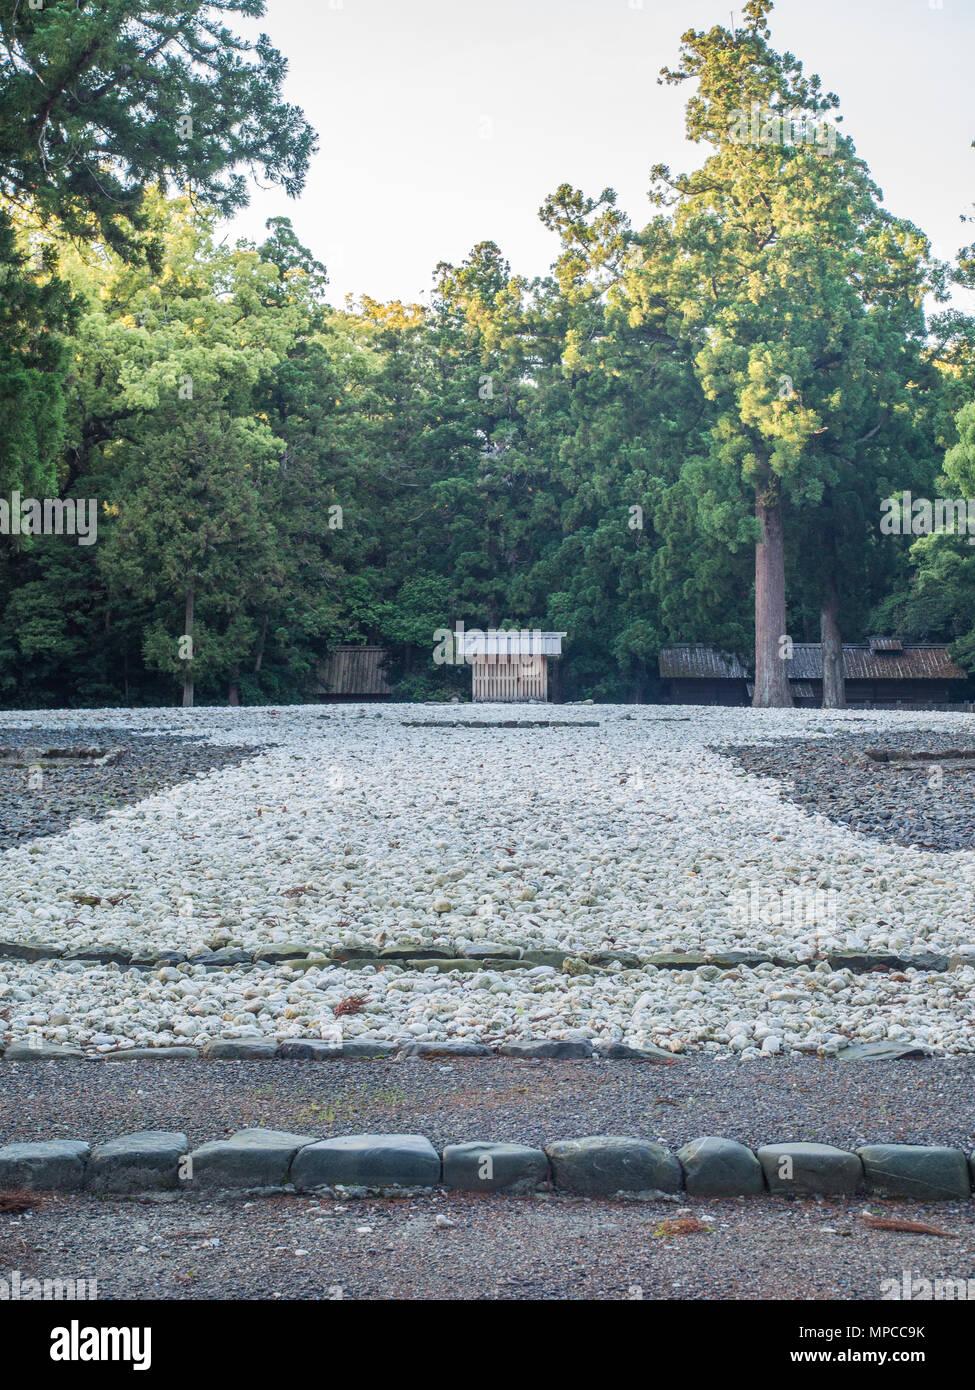 Goshoden main sanctuary Kodenchi  and Oi-ya building containg sacred central pole shin-no-mihashira, sacred forest behind, Geku,  Ise Jingu, Japan - Stock Image